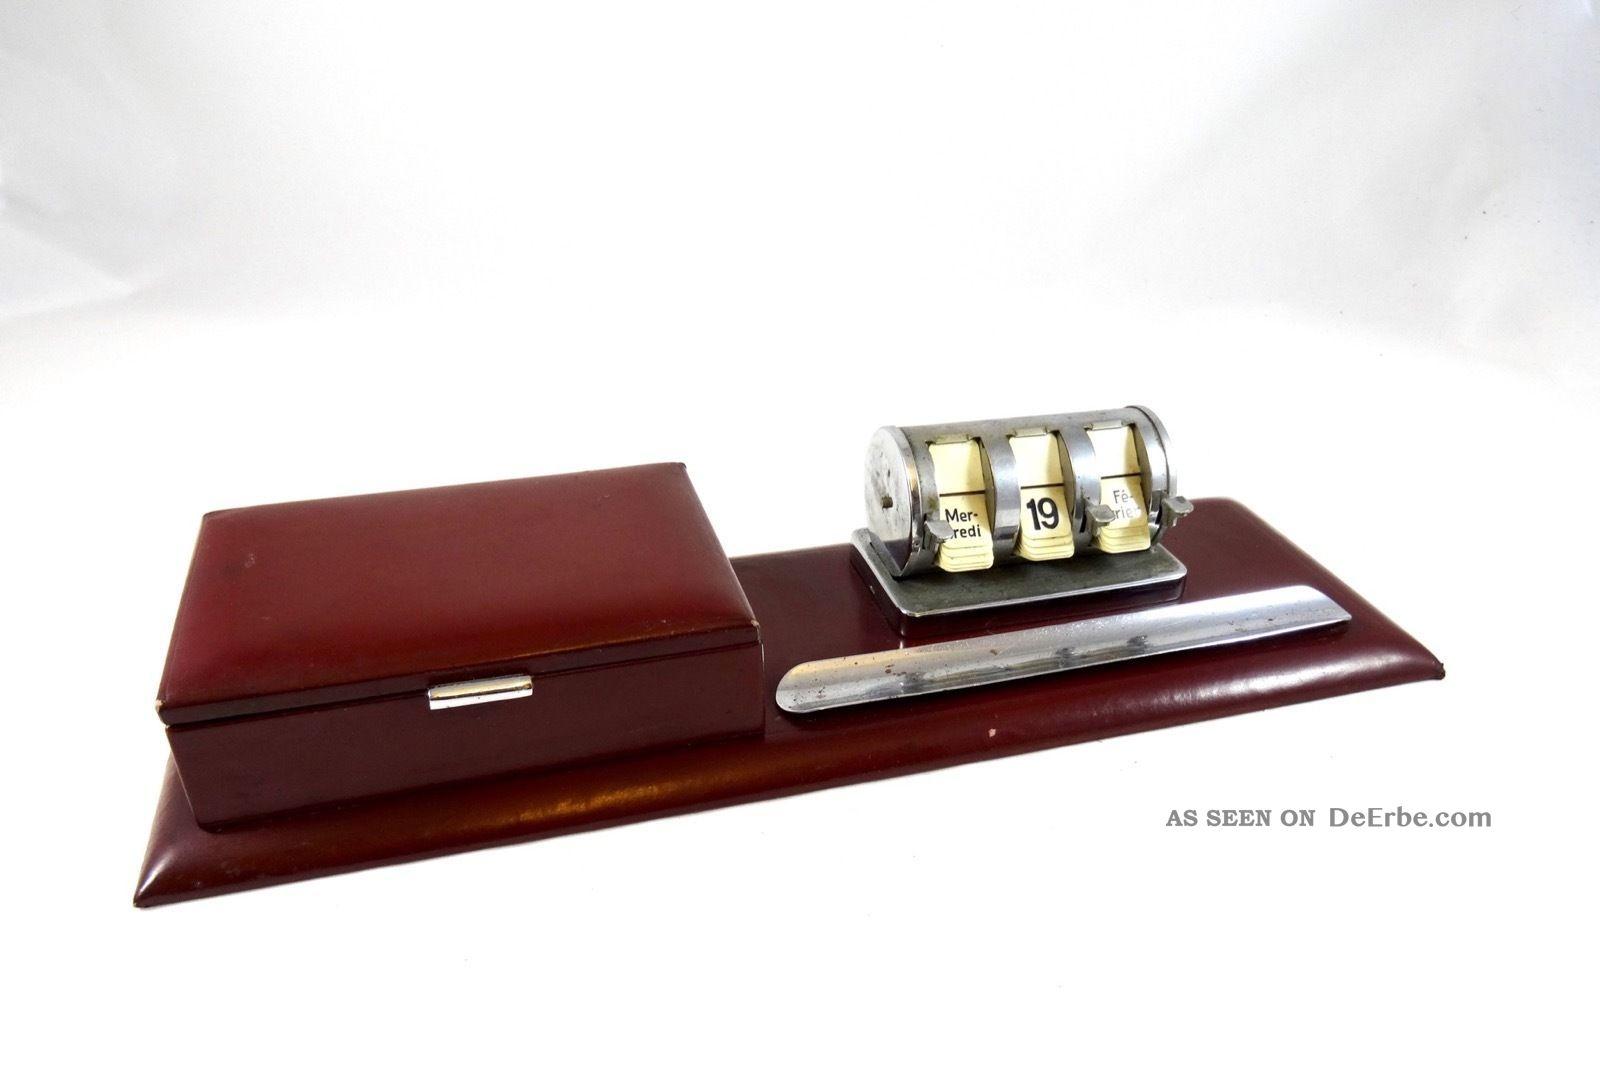 Art Deco Modernist Ablage Bauhuas Utensilo 30er Flip Kalender Bauhaus 1920-1949, Art Déco Bild